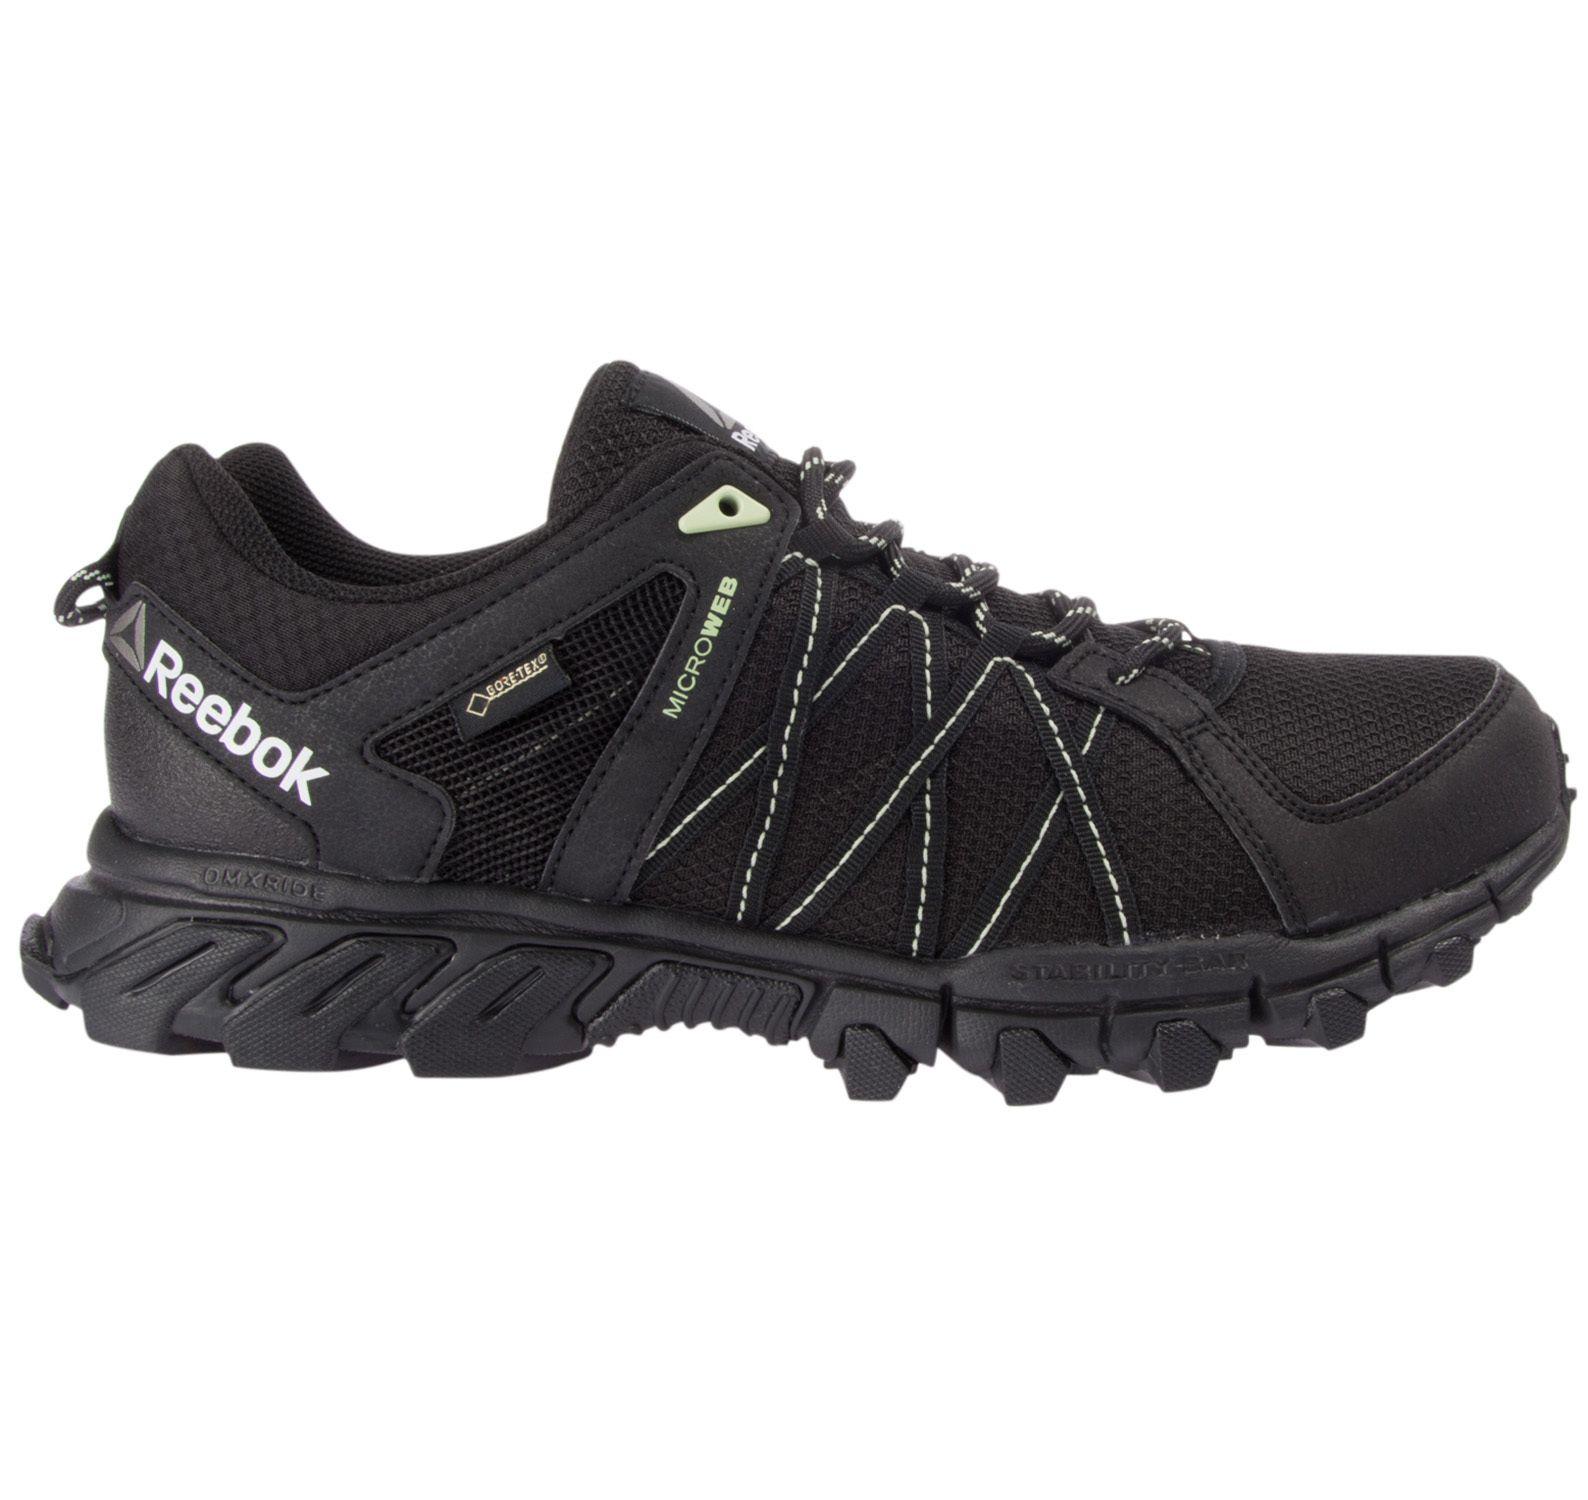 Trailgrip Rs 5.0 Gtx, Black/Aloe, 41